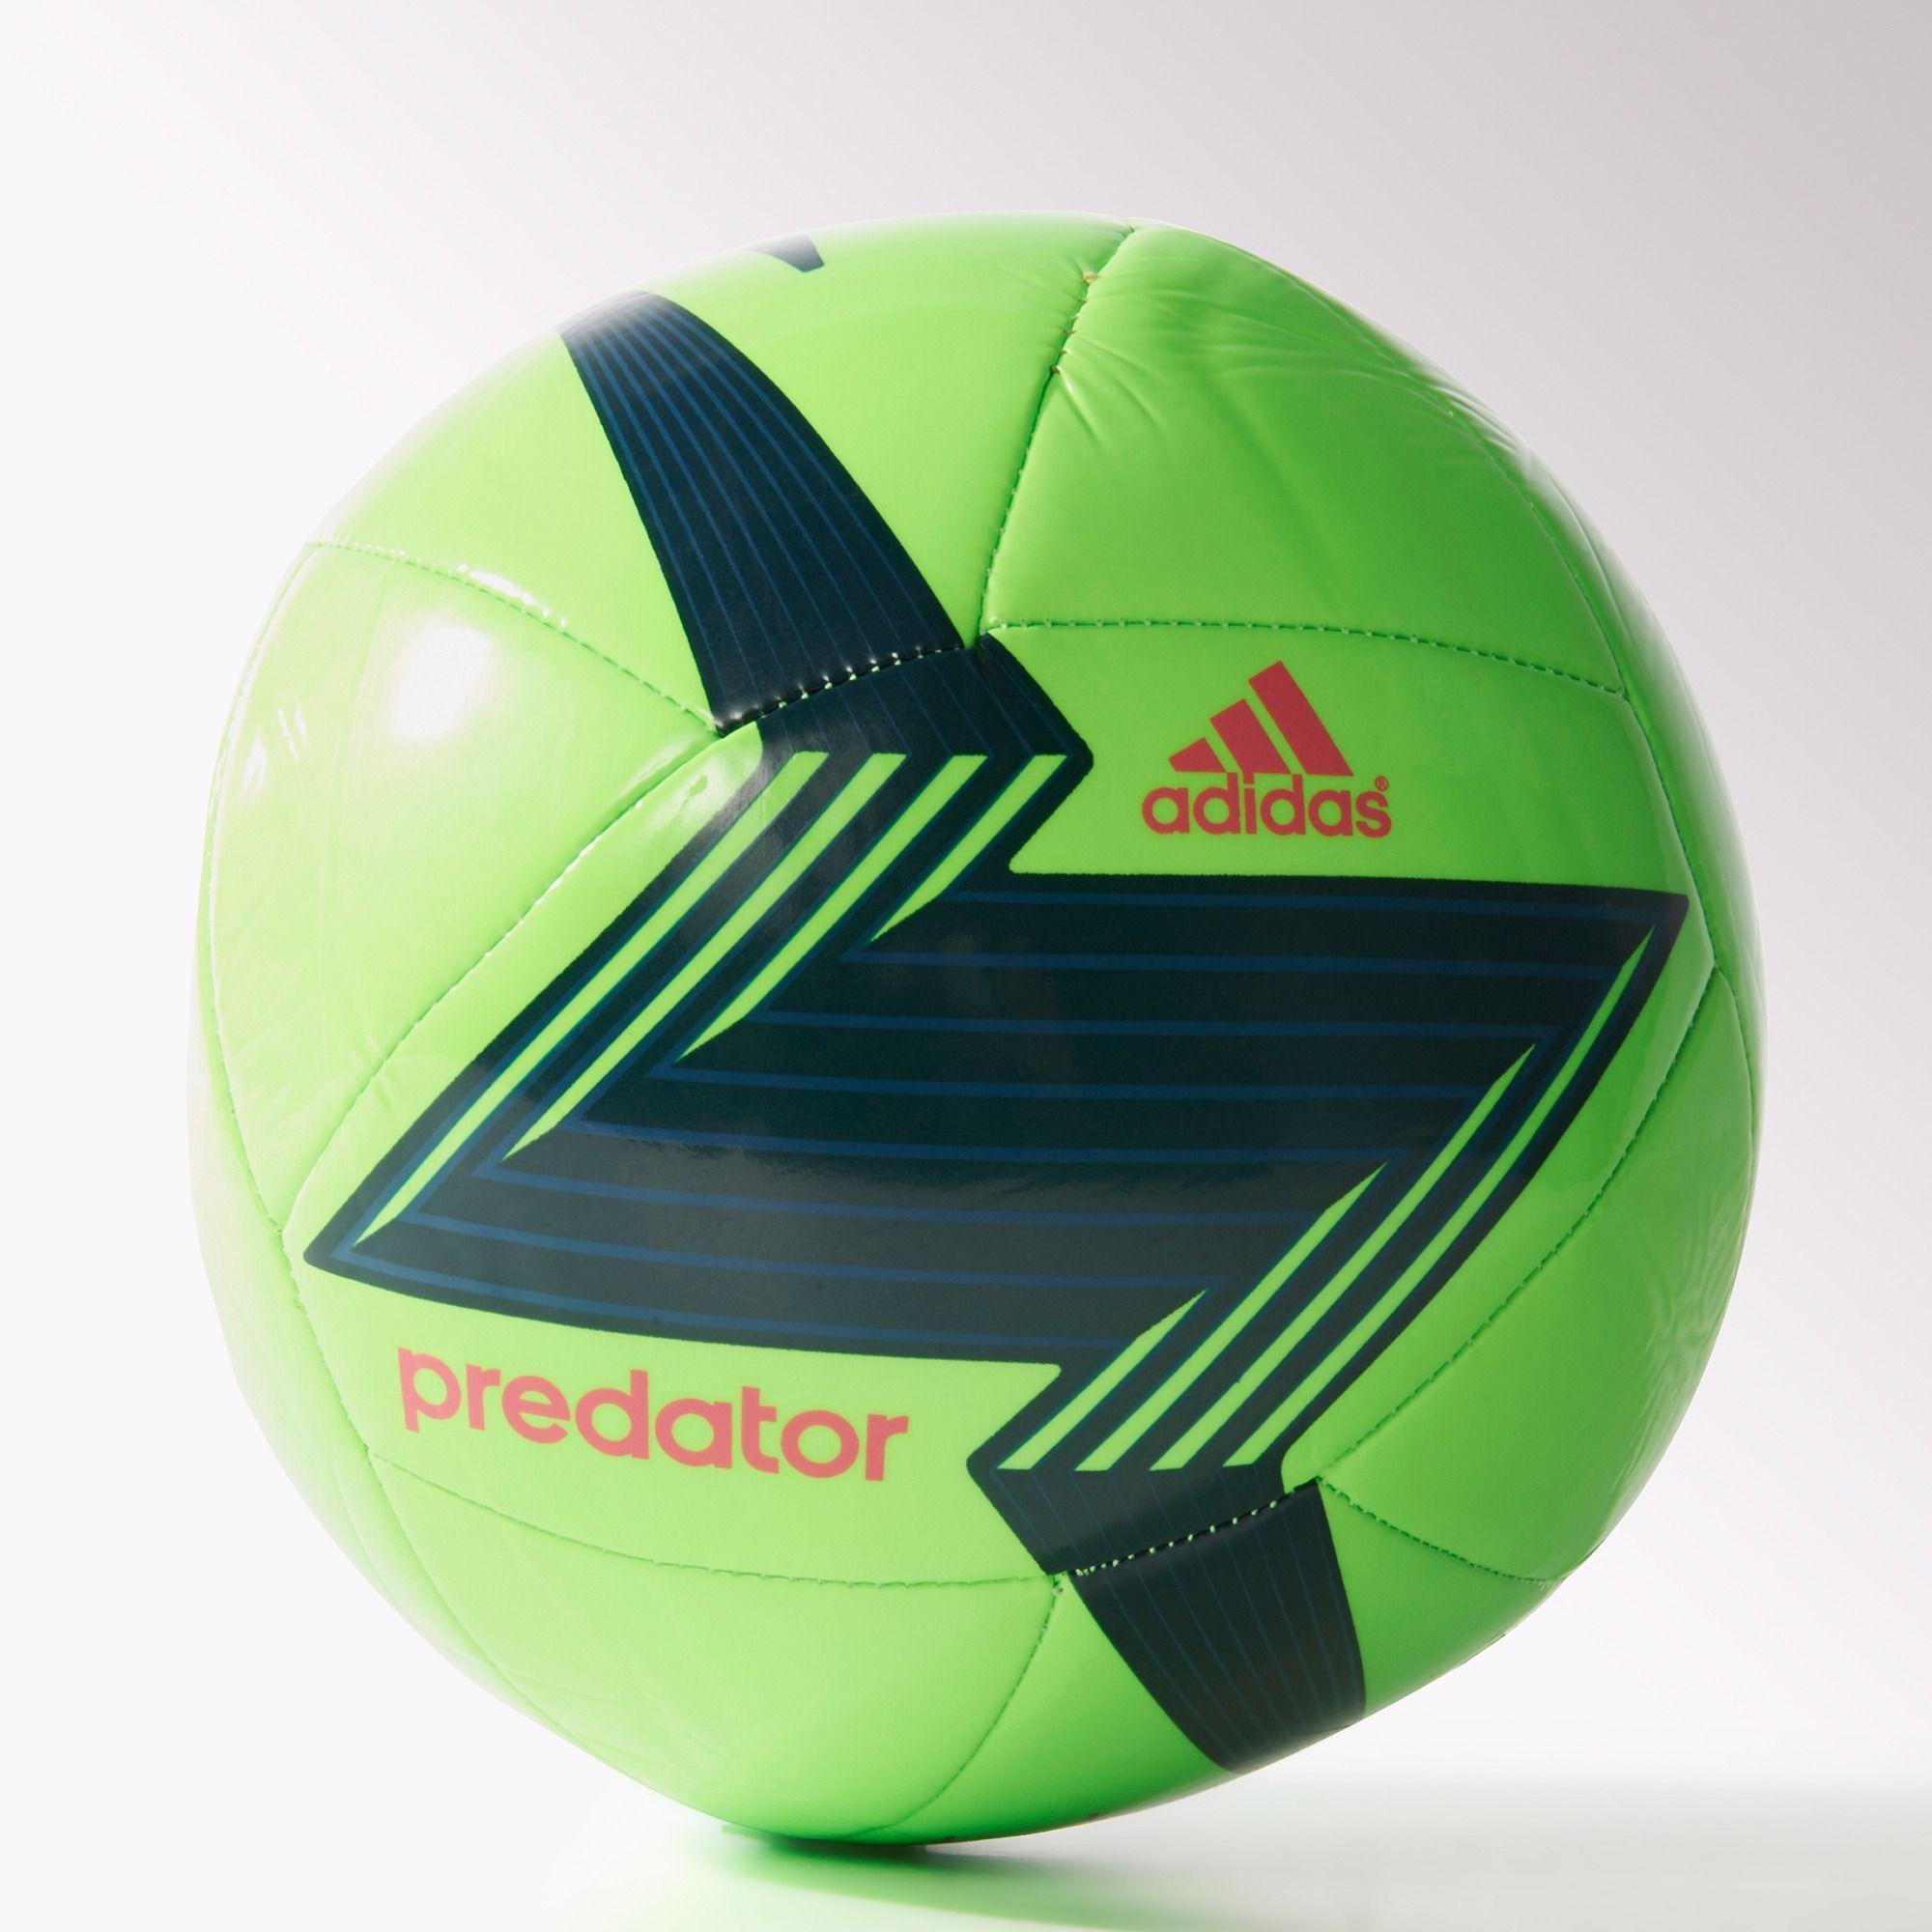 f16e414a114 adidas - Predator Glider Soccer Ball | ลูก ฟุต บอล | Soccer Soccer ...